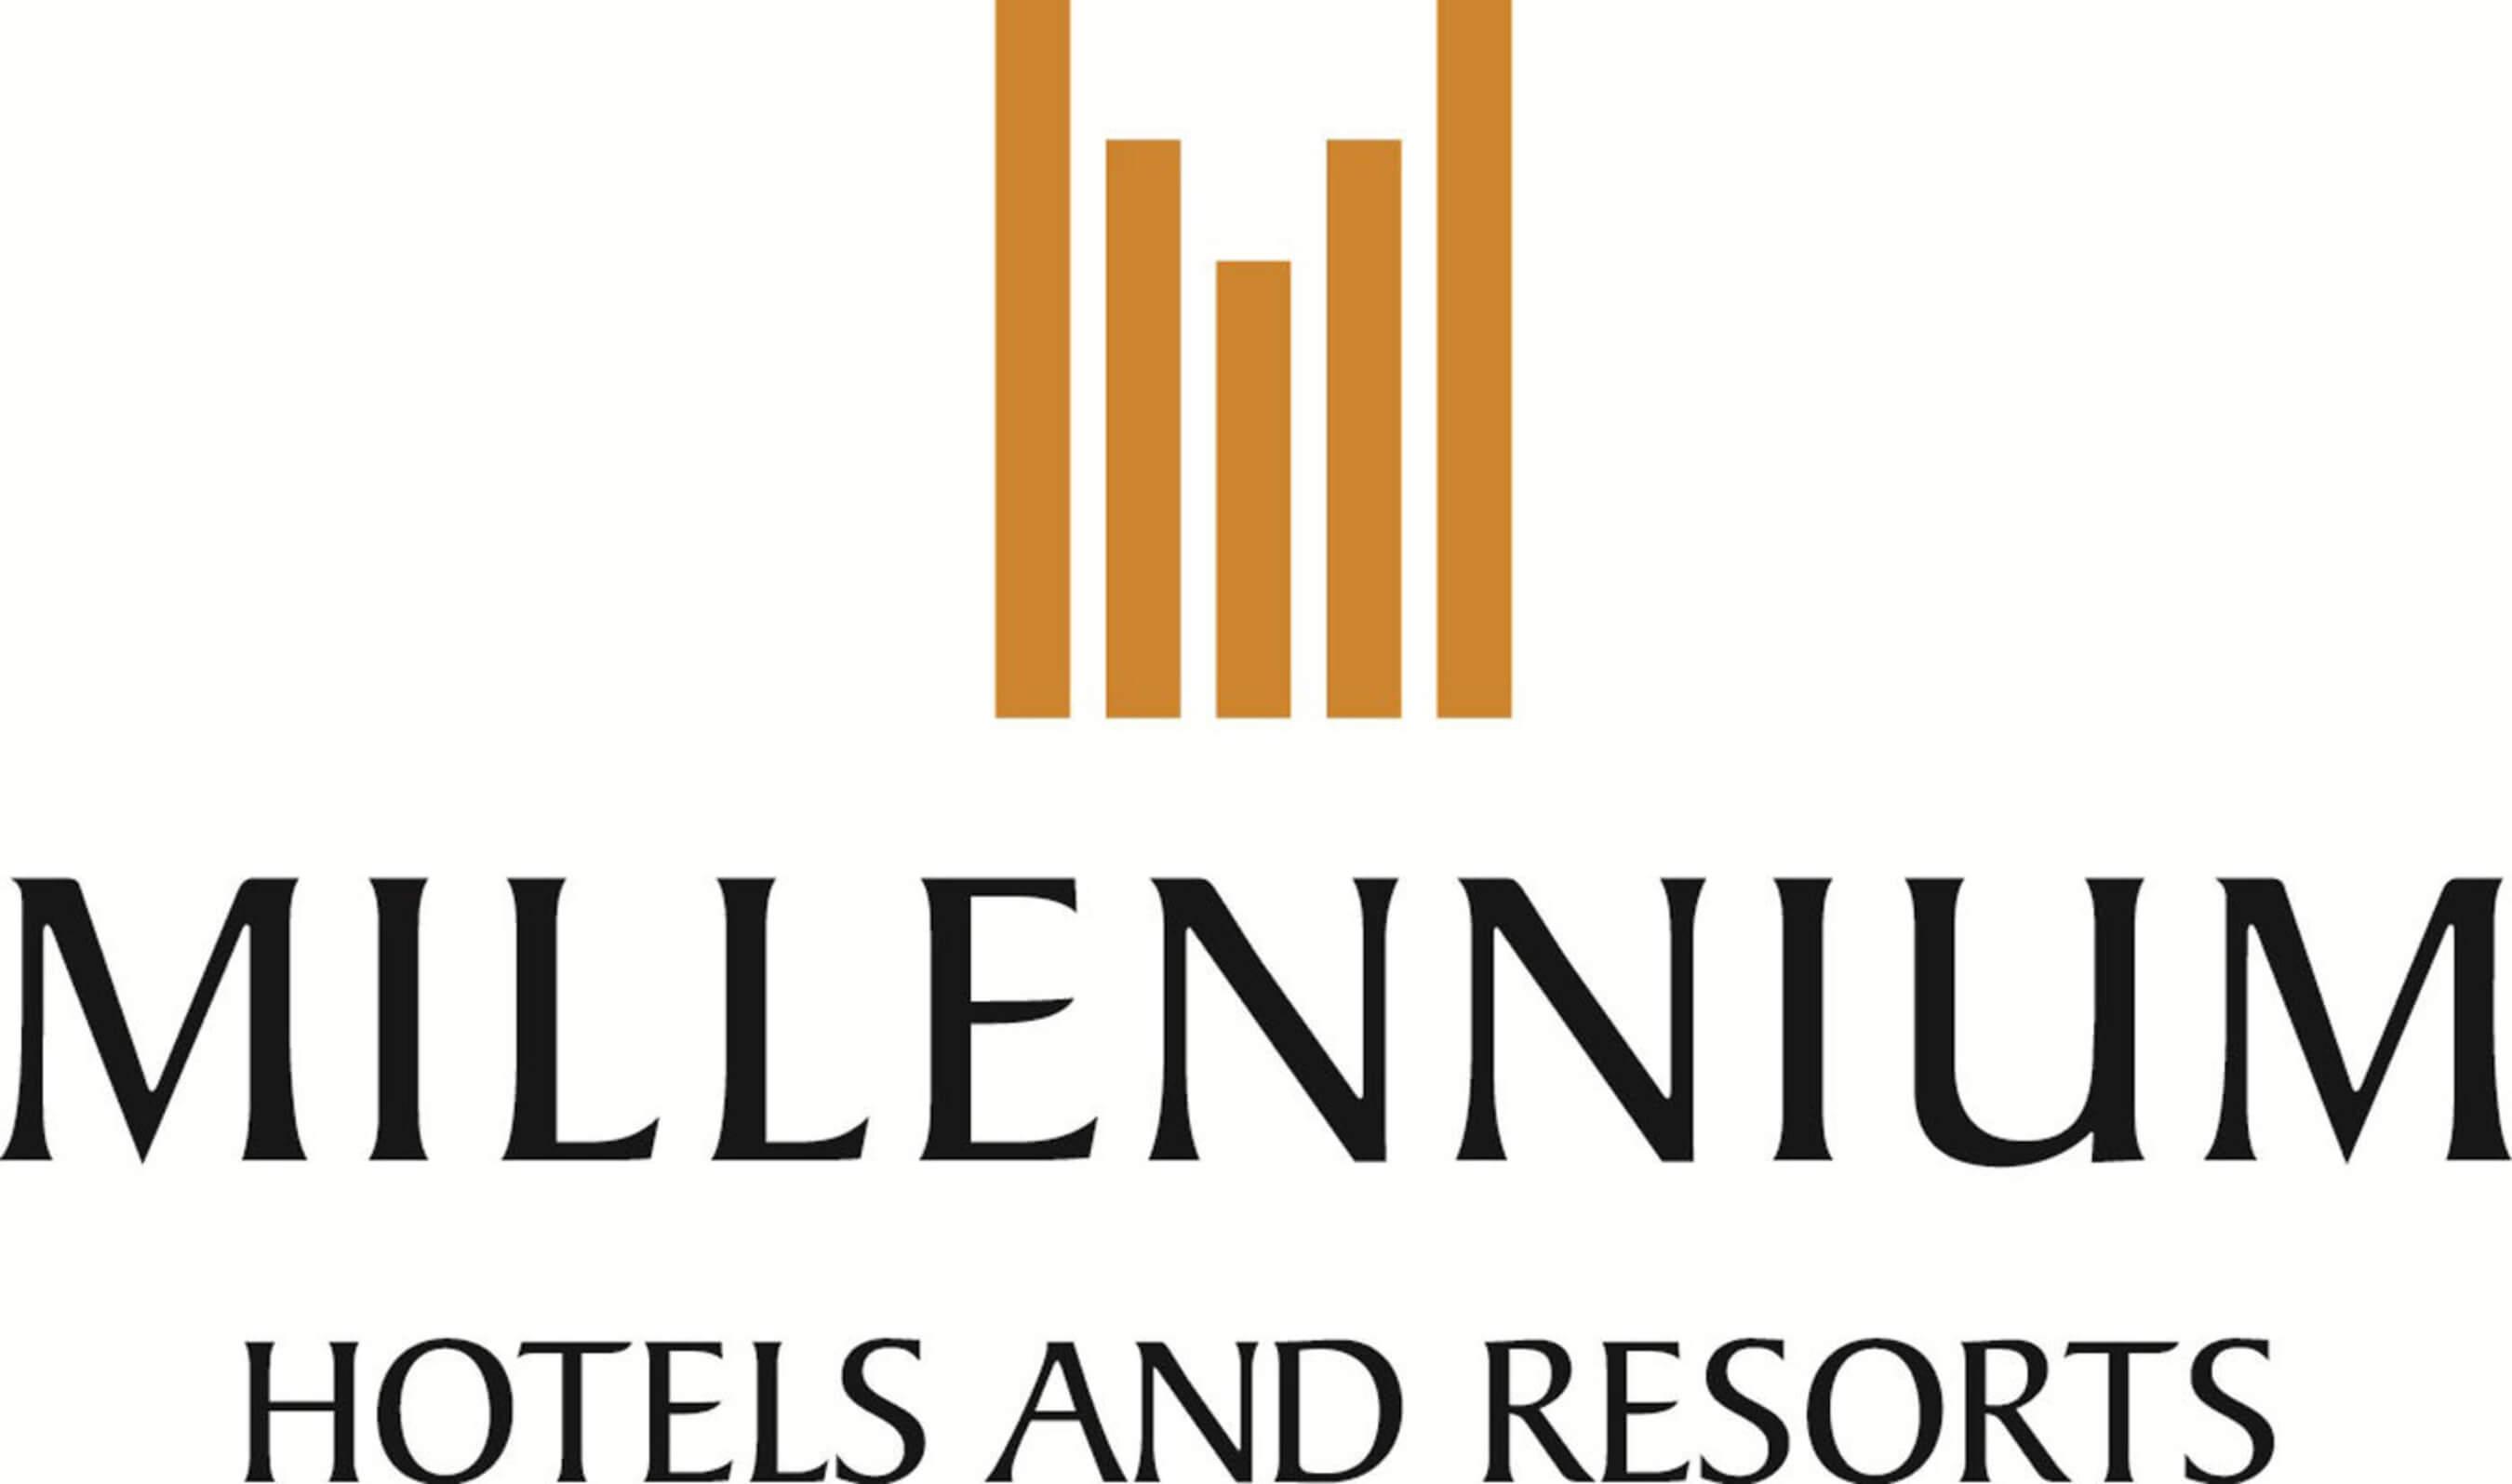 Millennium & Copthorne Hotels - Millennium M Social Singapore starting from USD 132 per night